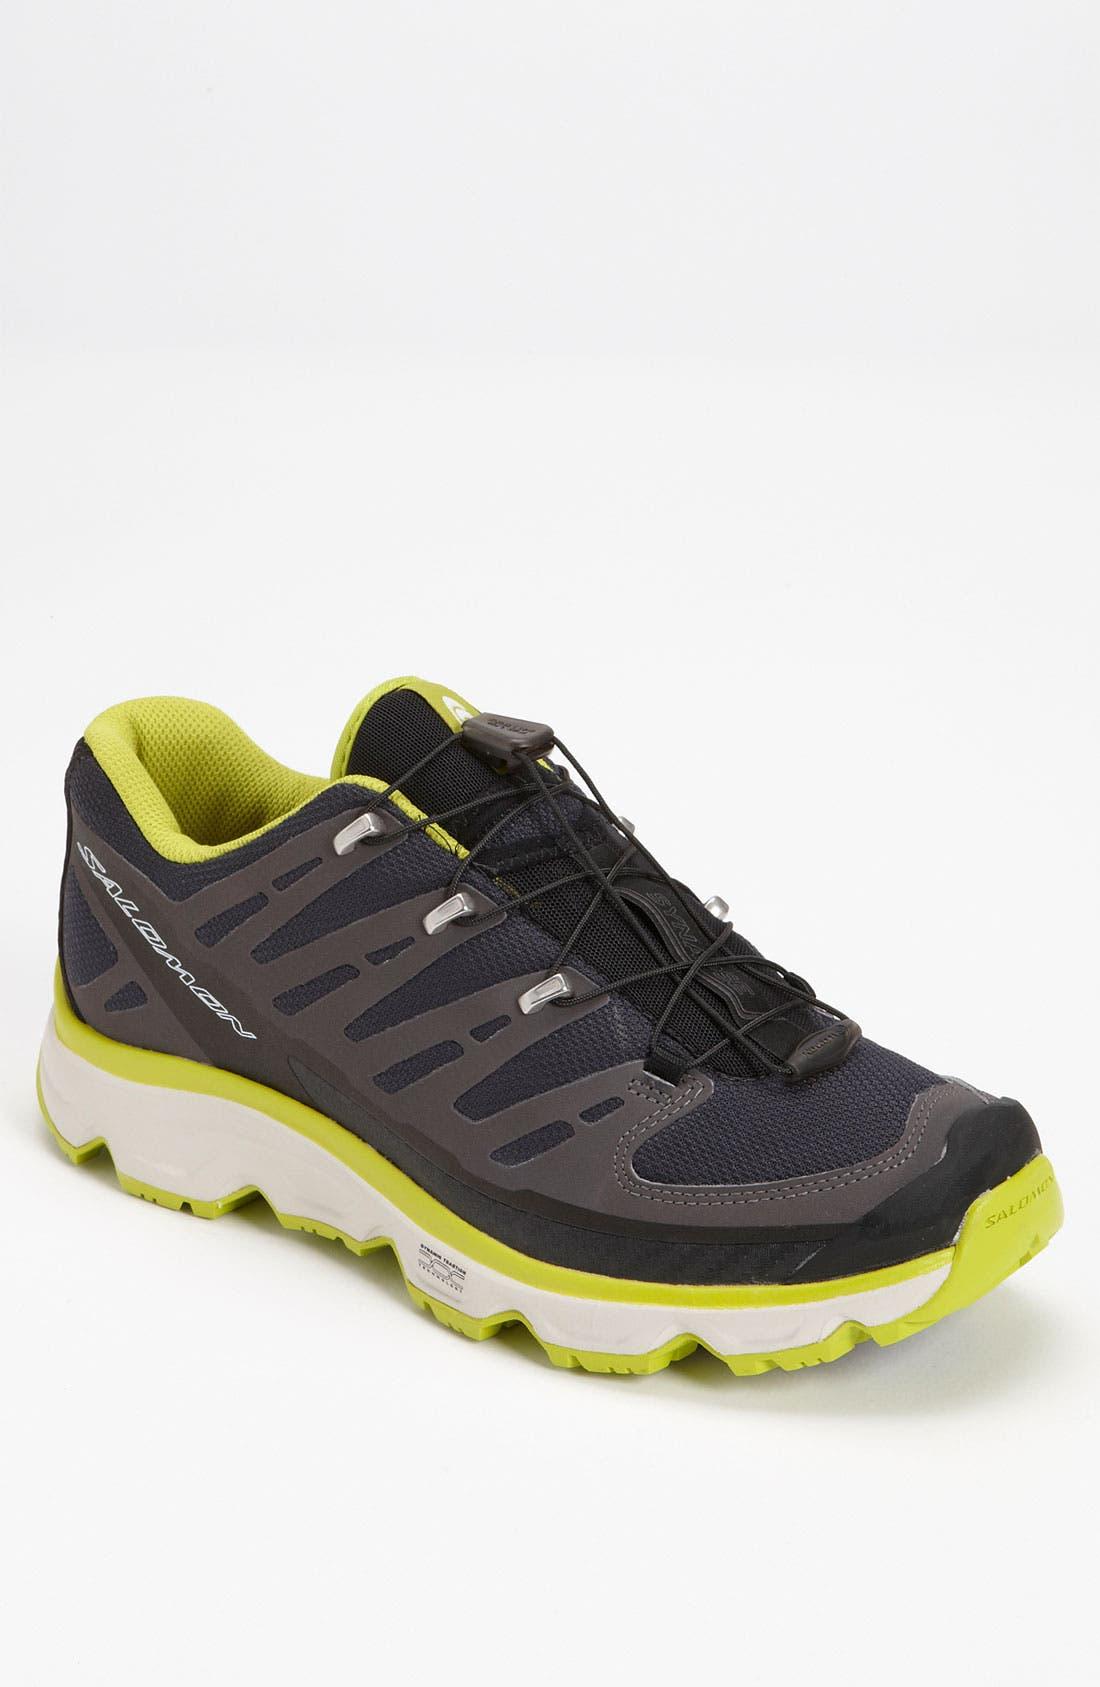 Alternate Image 1 Selected - Salomon 'Synapse' Hiking Shoe (Men)